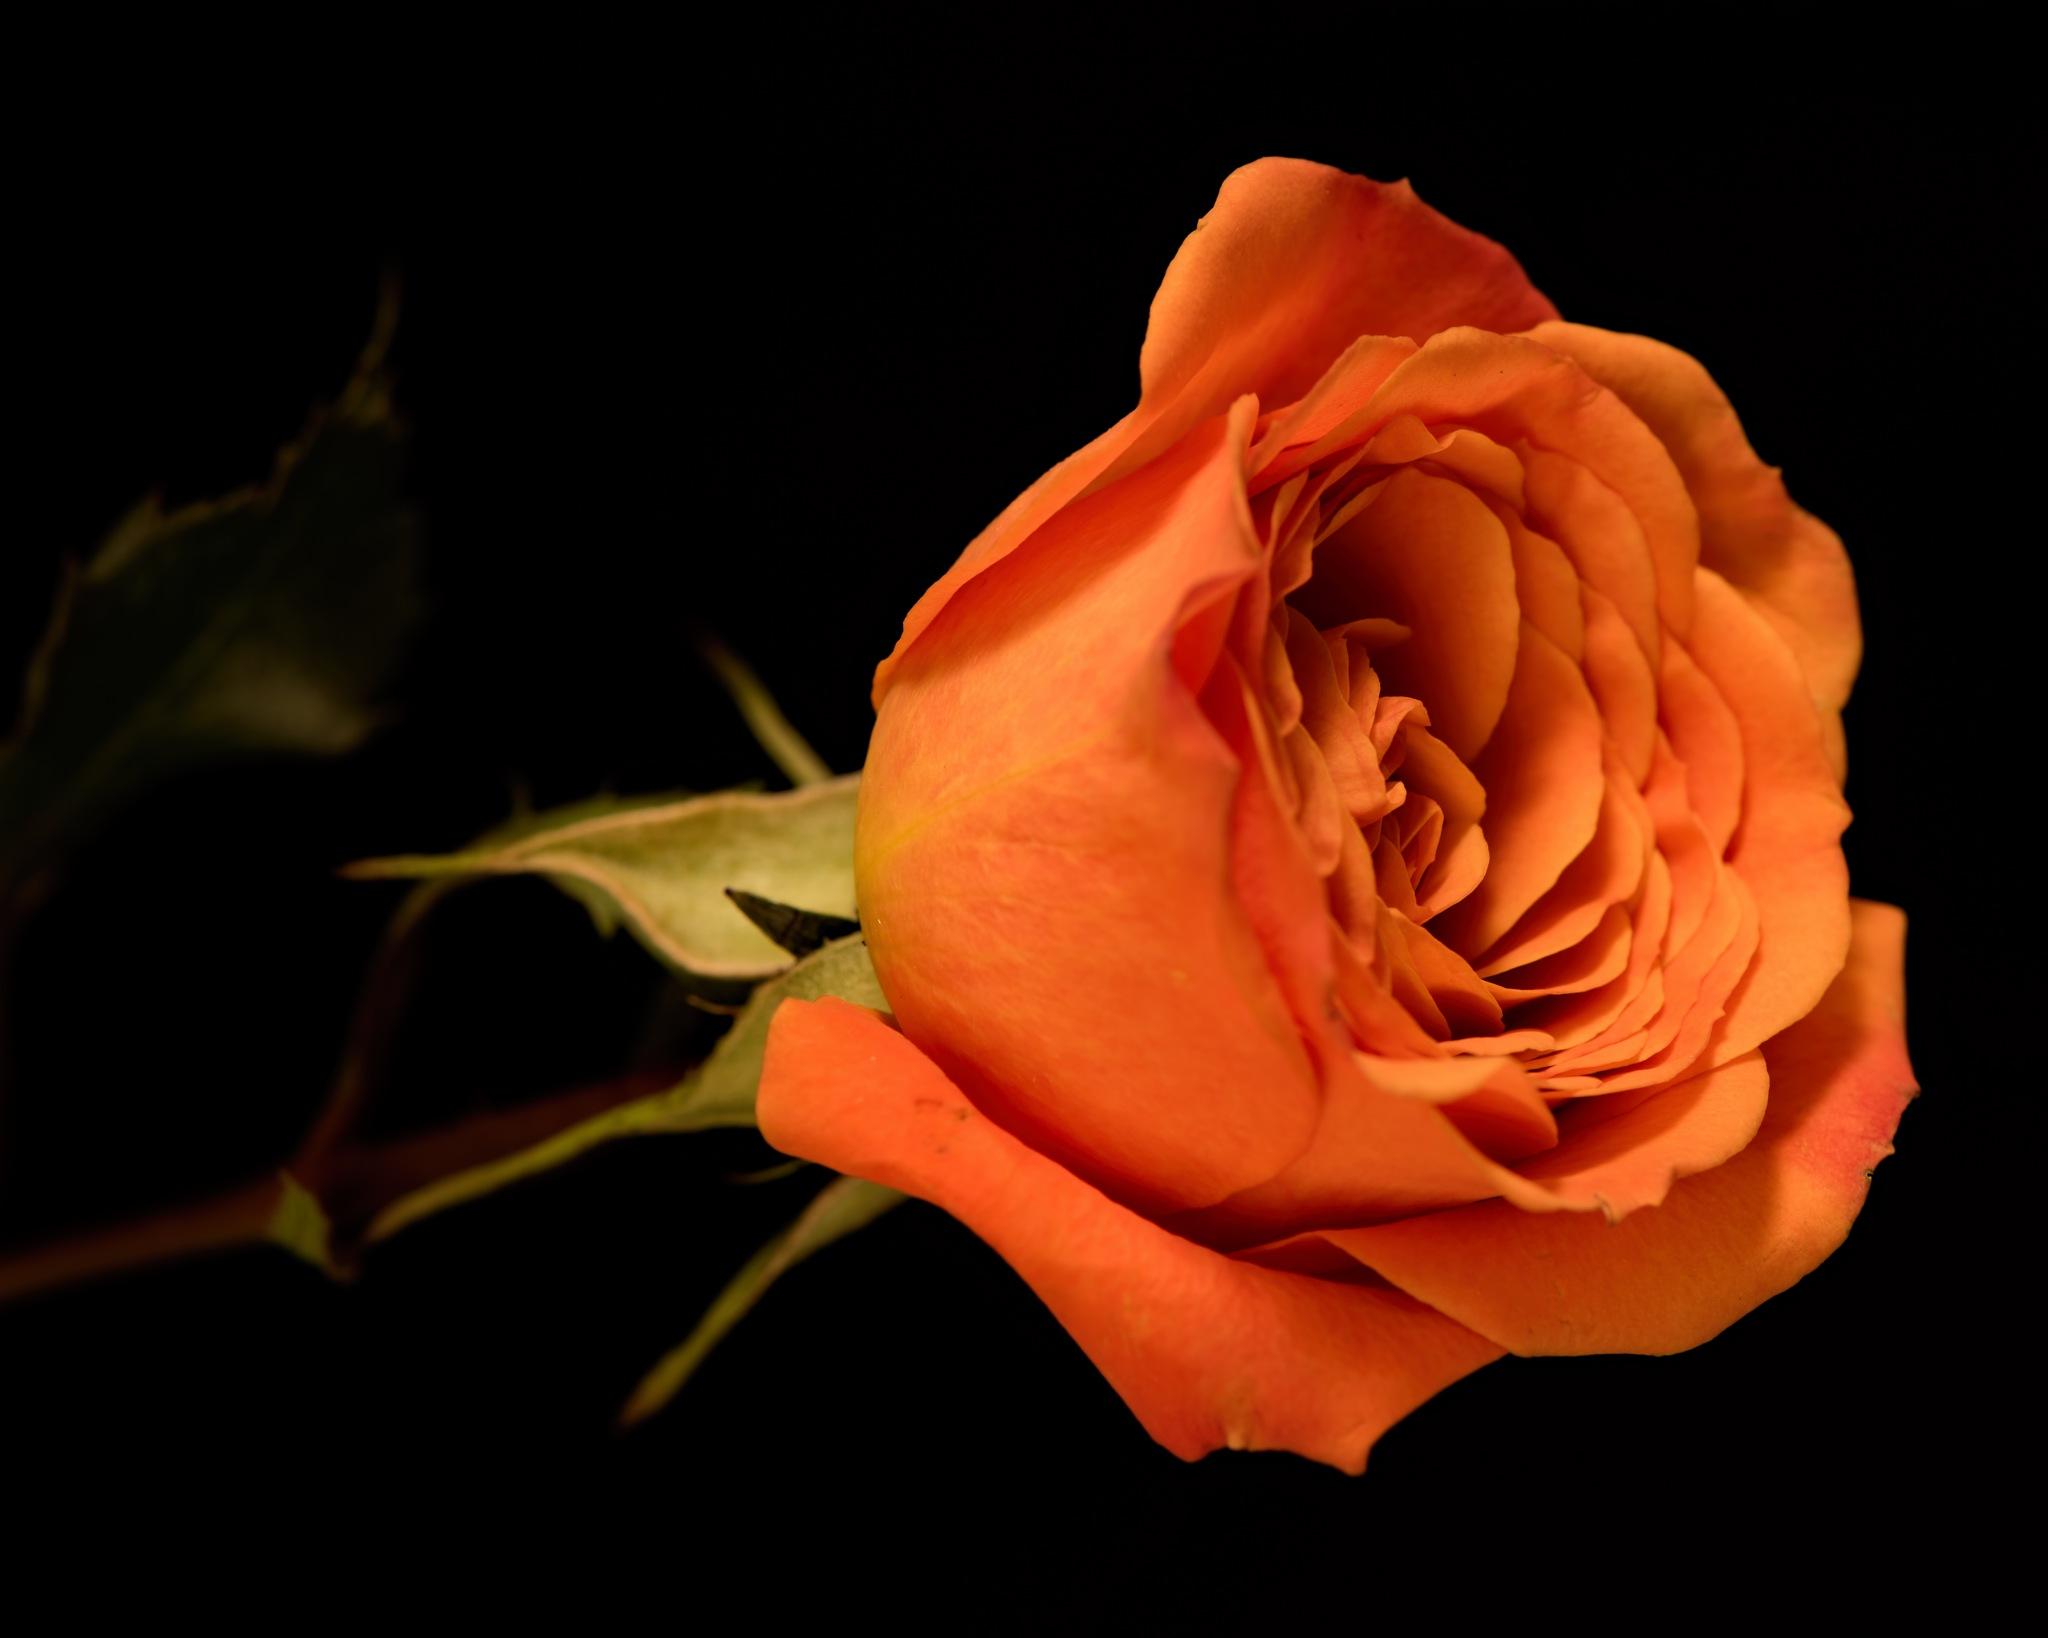 Single Orange Rose 1003 by ThomasJerger